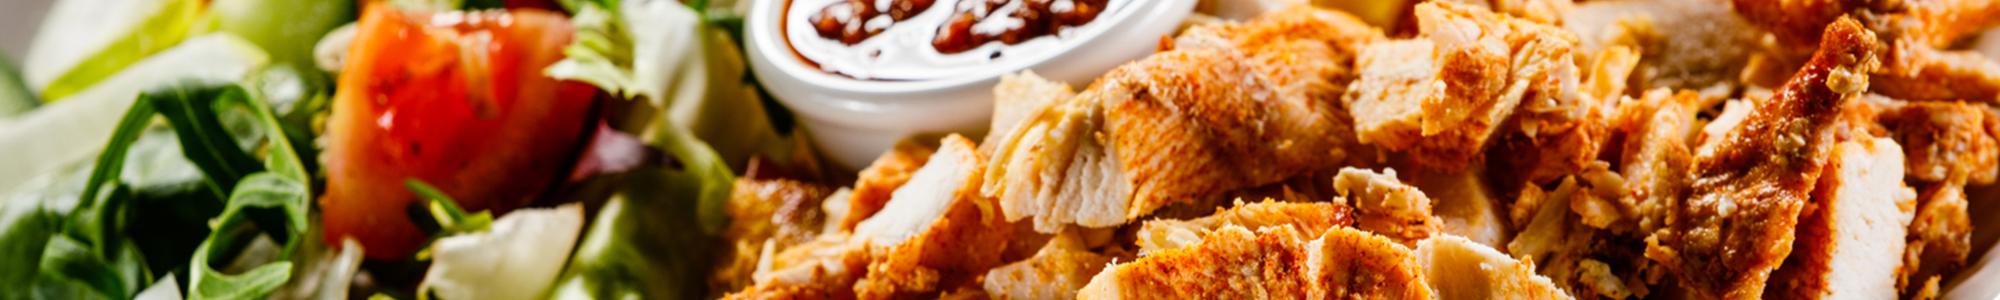 Kyckling-tallrik